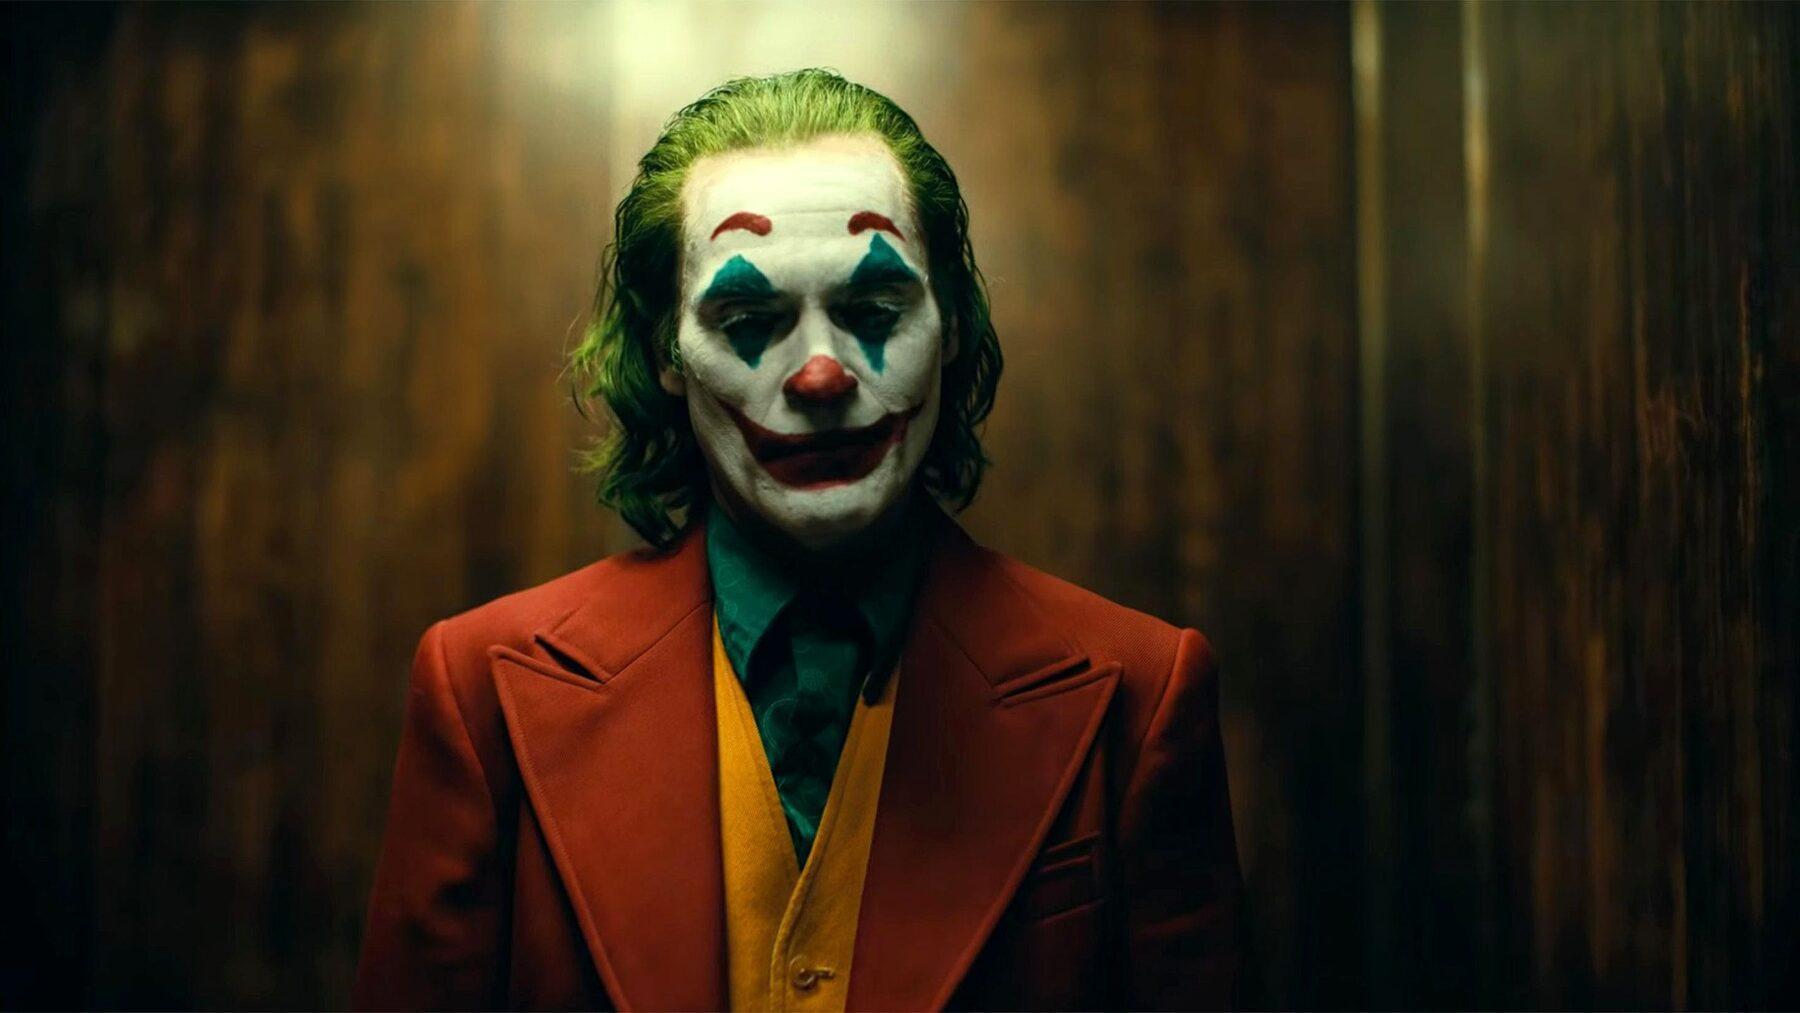 Mass Nerder – The Joker Film Discussion with Rapper Mer